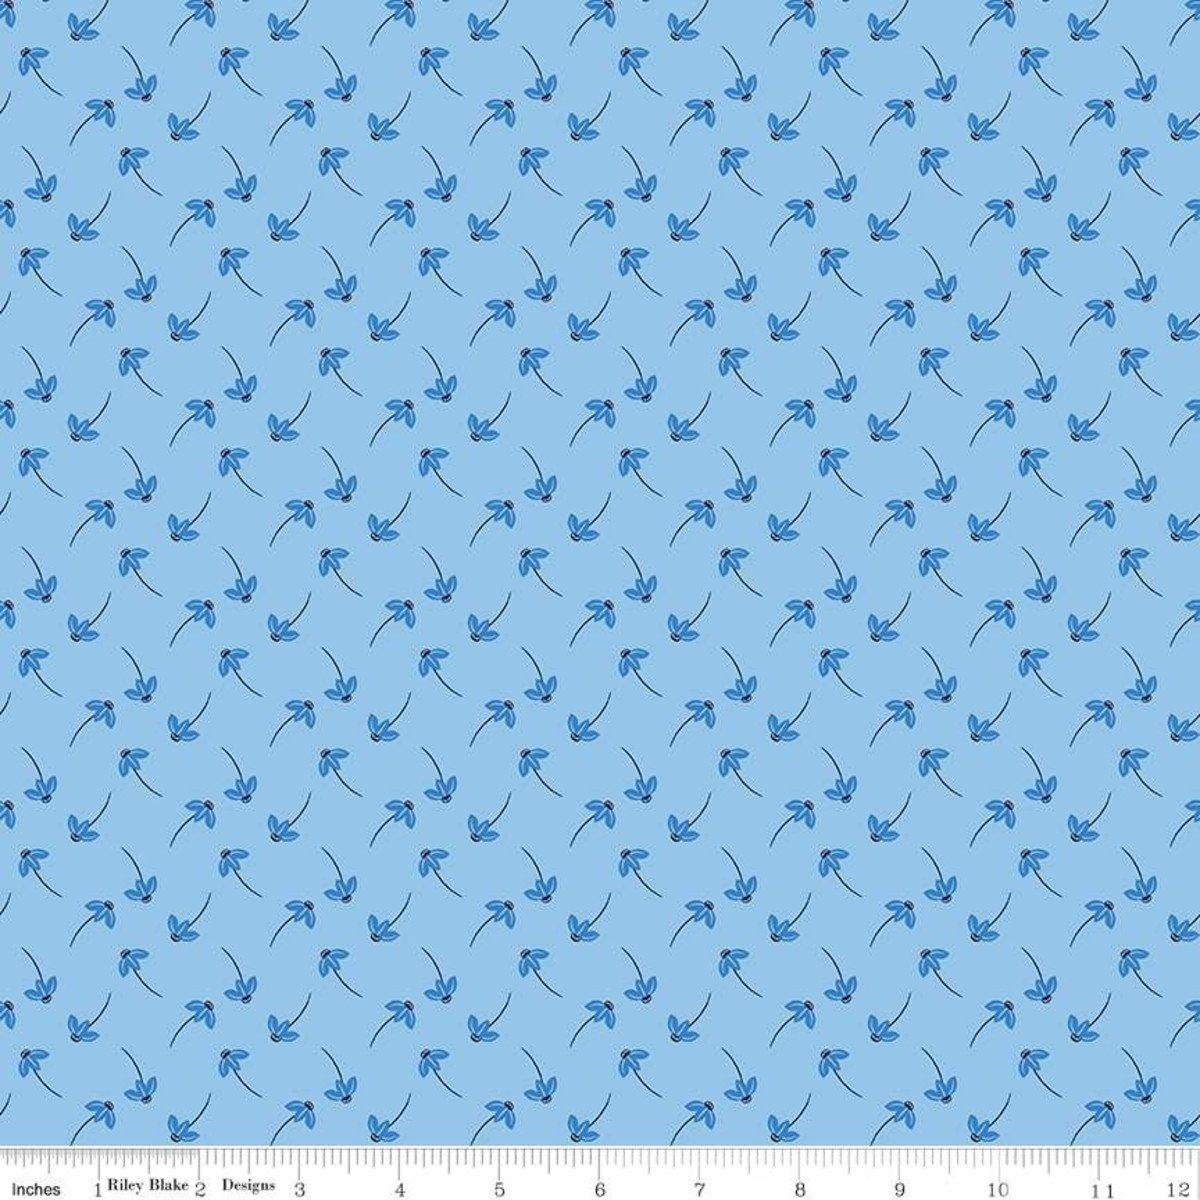 Blue Stitch - Daisy Sky